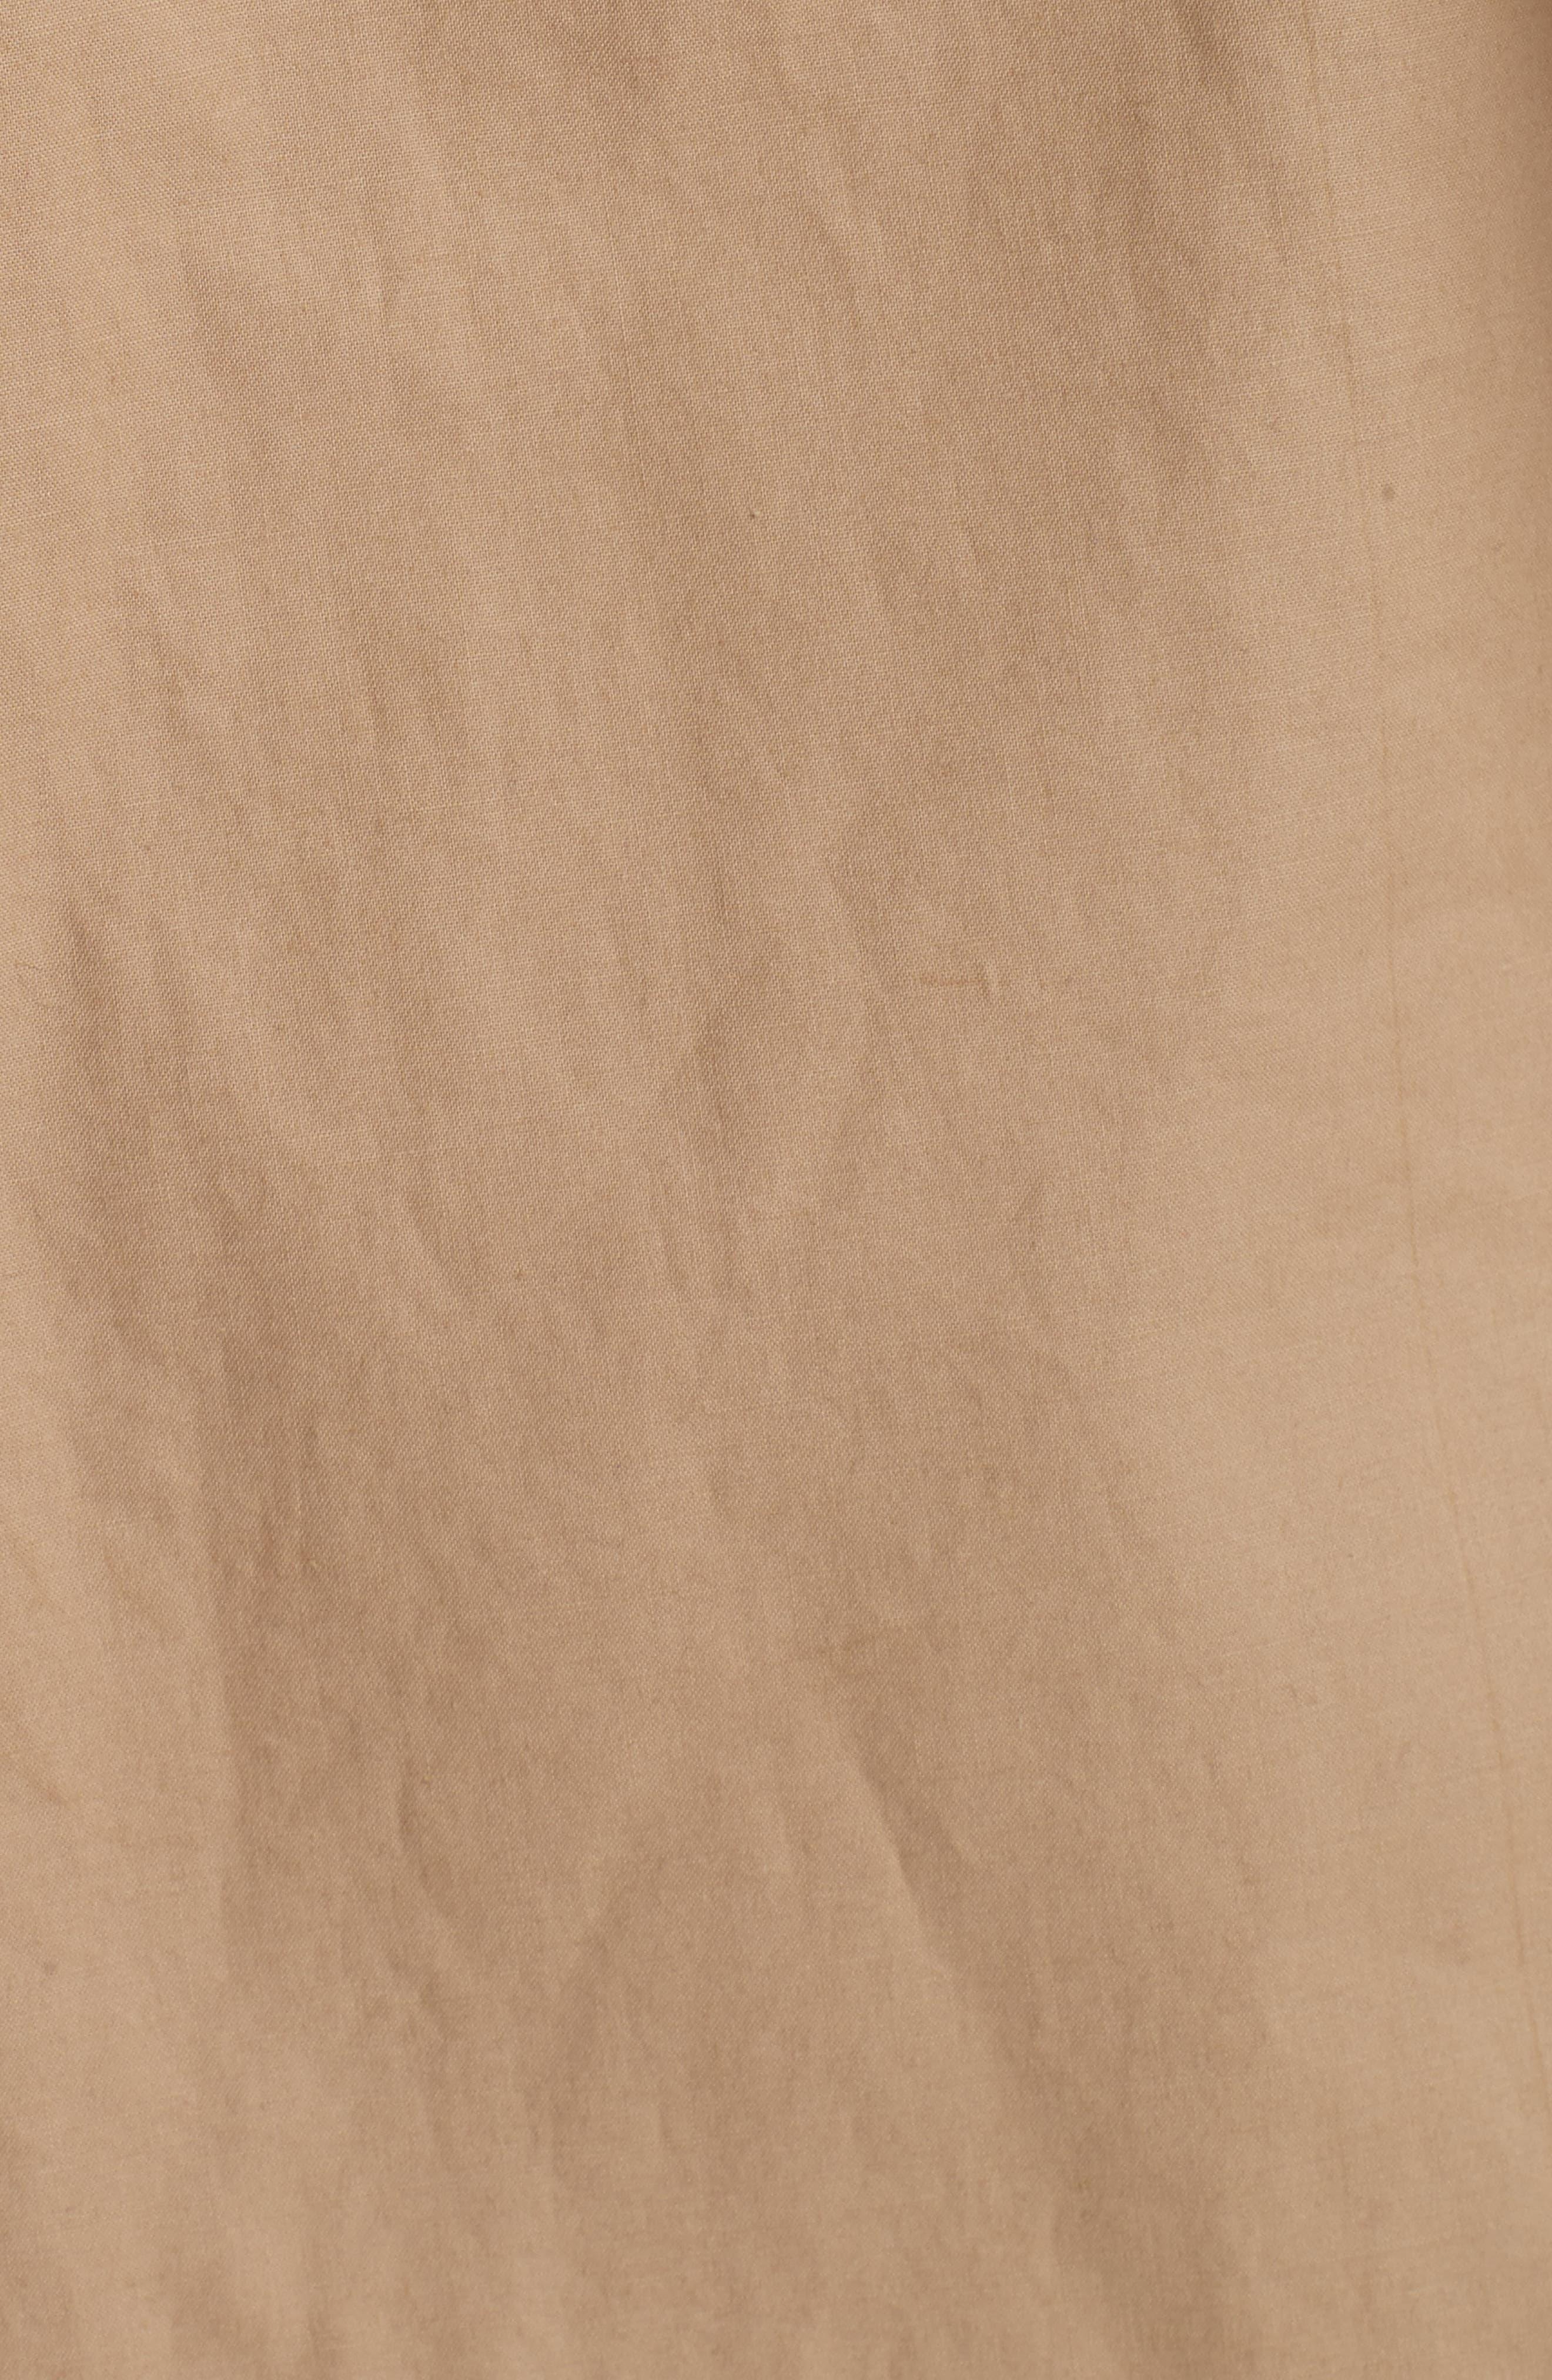 Bonded Poplin Trench Coat,                             Alternate thumbnail 6, color,                             Khaki